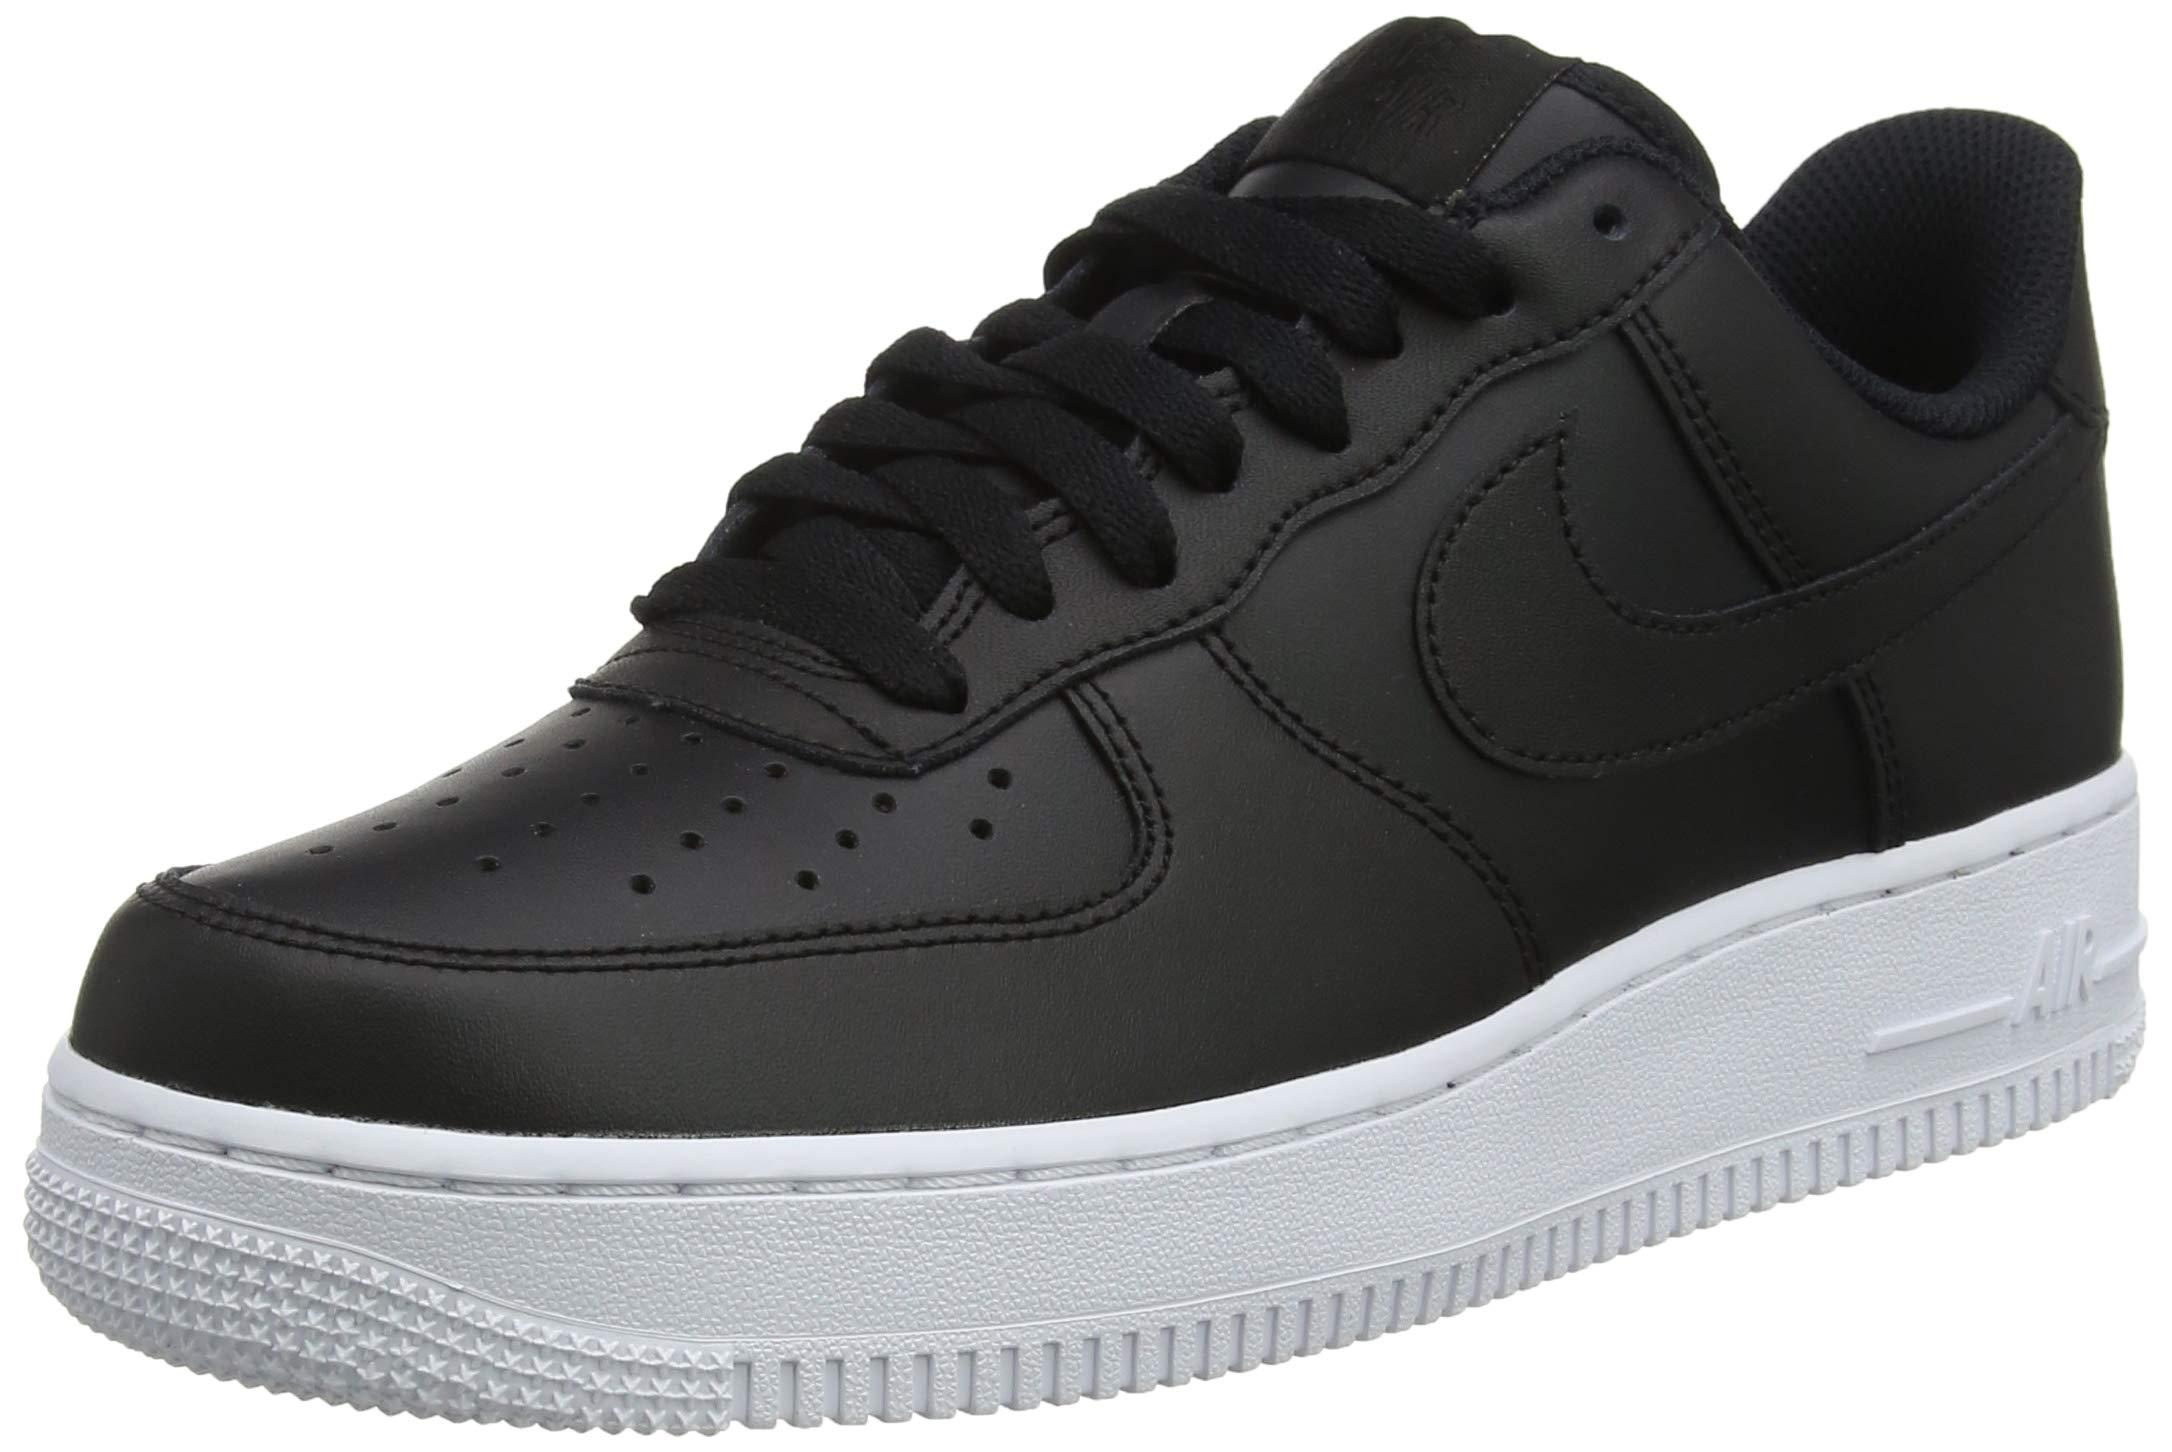 Nike Mens Air Force 1 07 Obsidian White